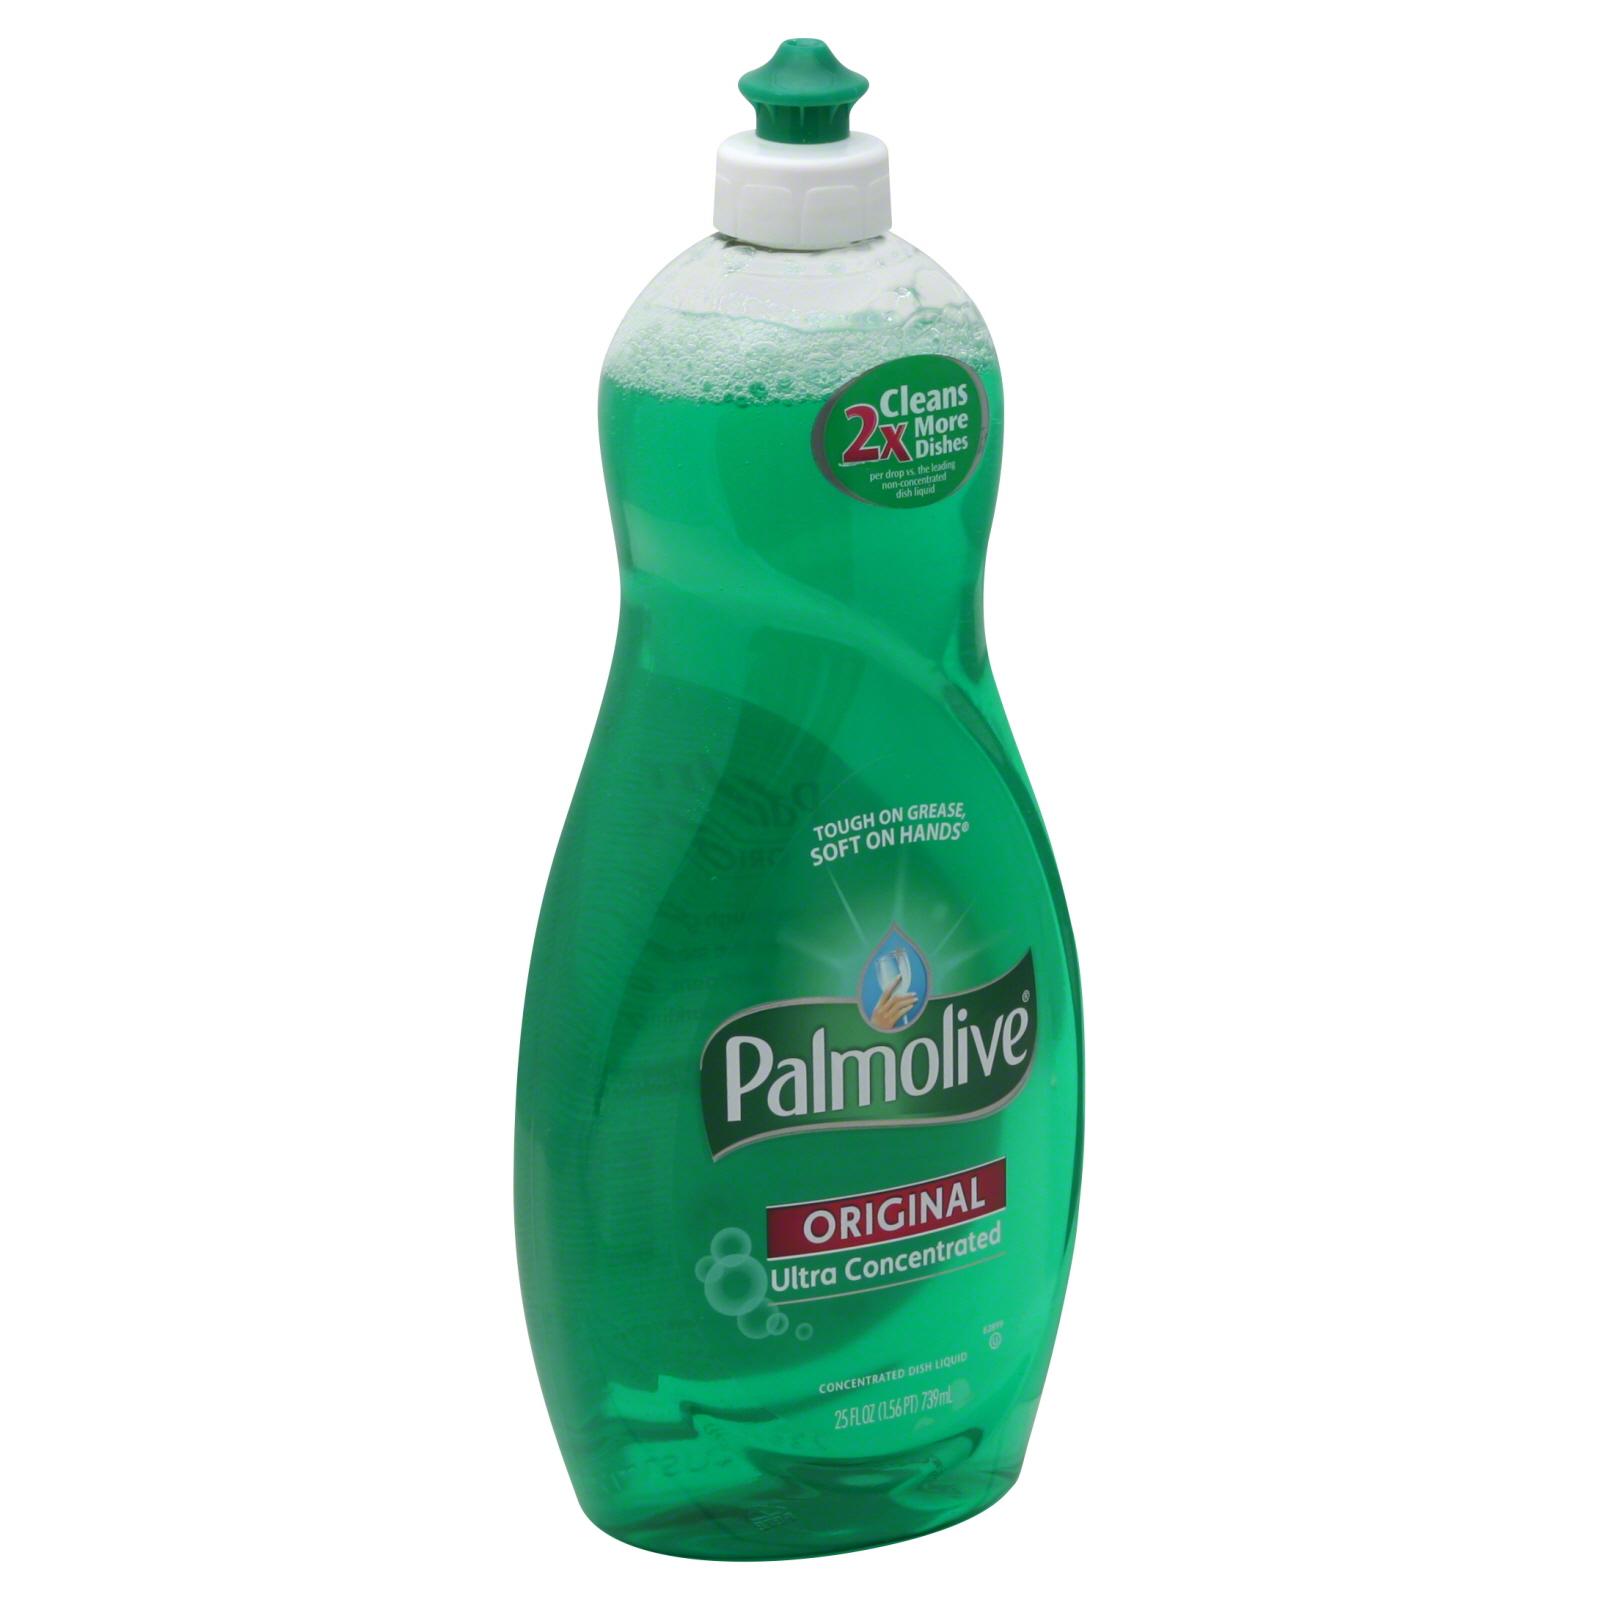 Palmolive Ultra Original Dish Liquid, 739 ml (Pack of 3) - image 1 of 1